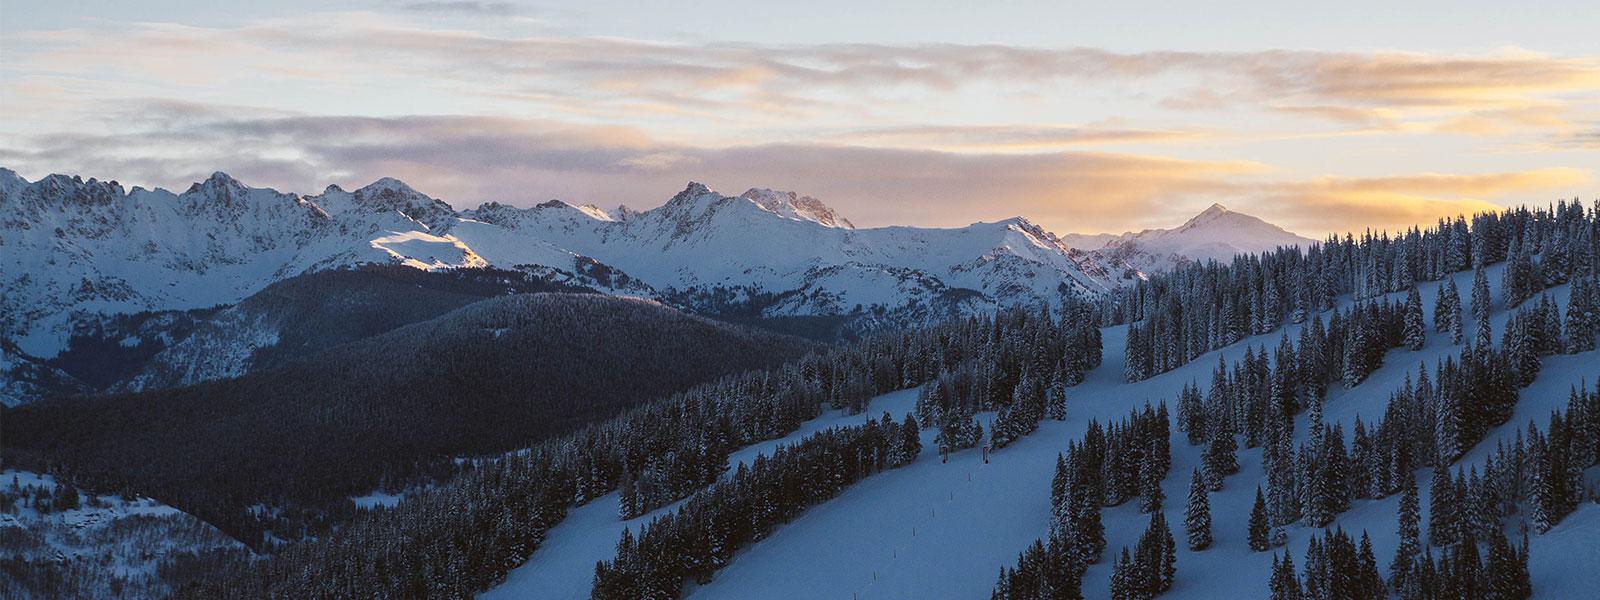 Alpenglow-Home-Image.jpg